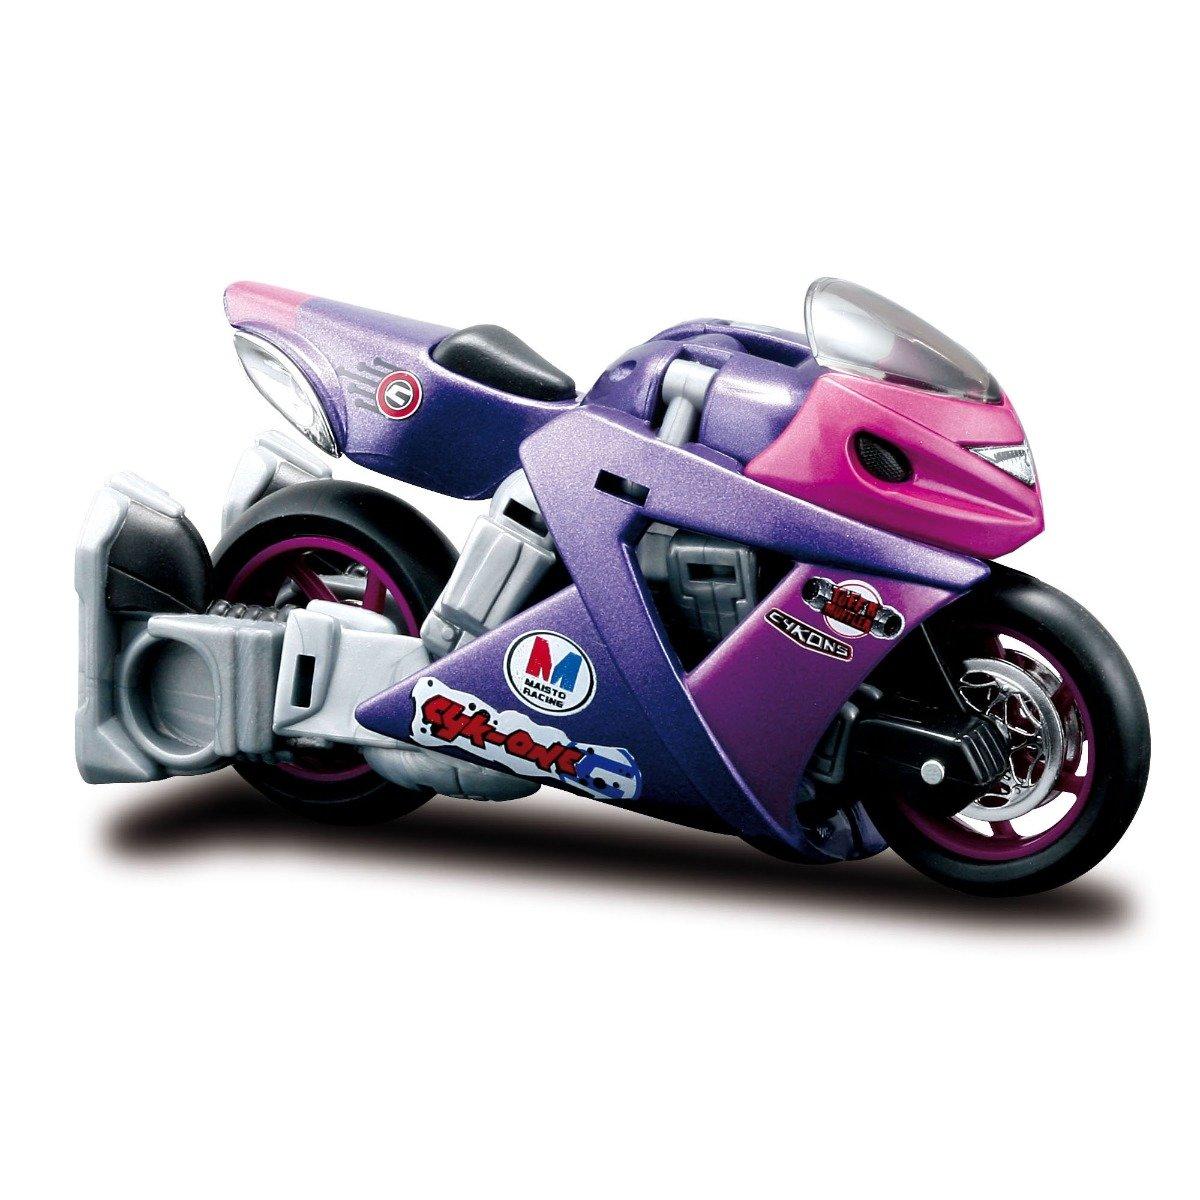 Motocicleta transformabila Maisto Cykons, 1:18, Cyk-One